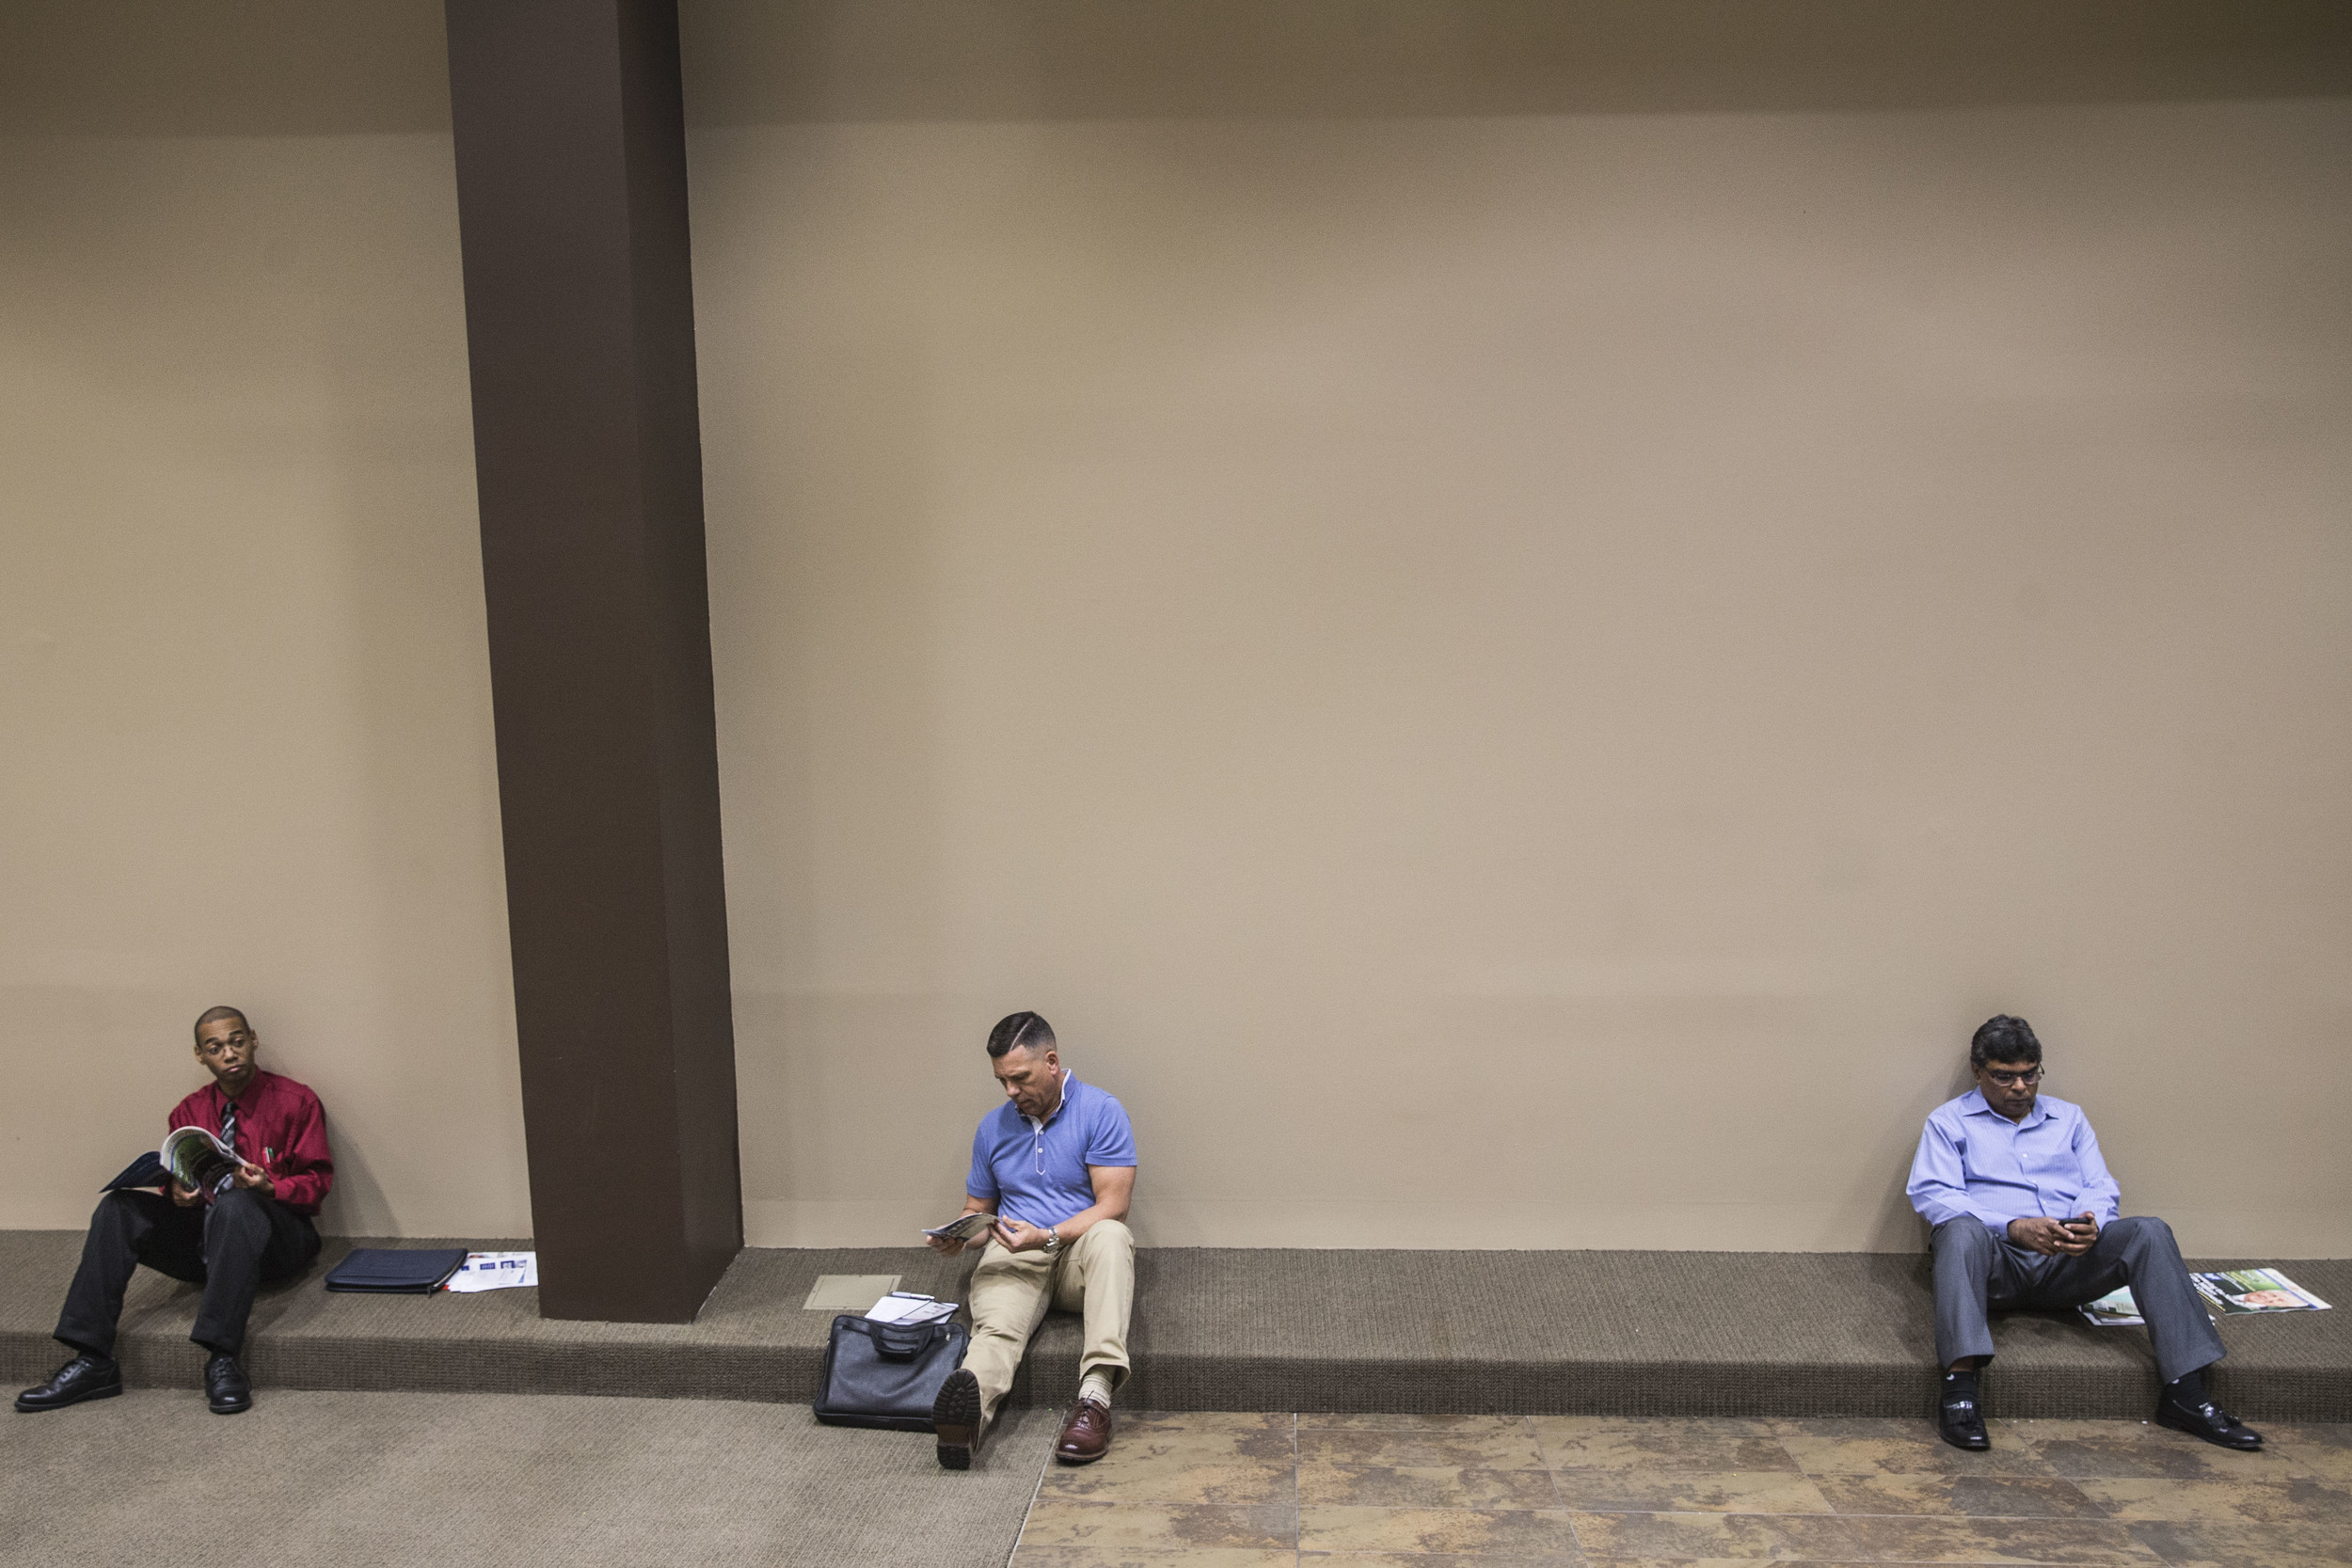 Veterans' job fair at Superdome